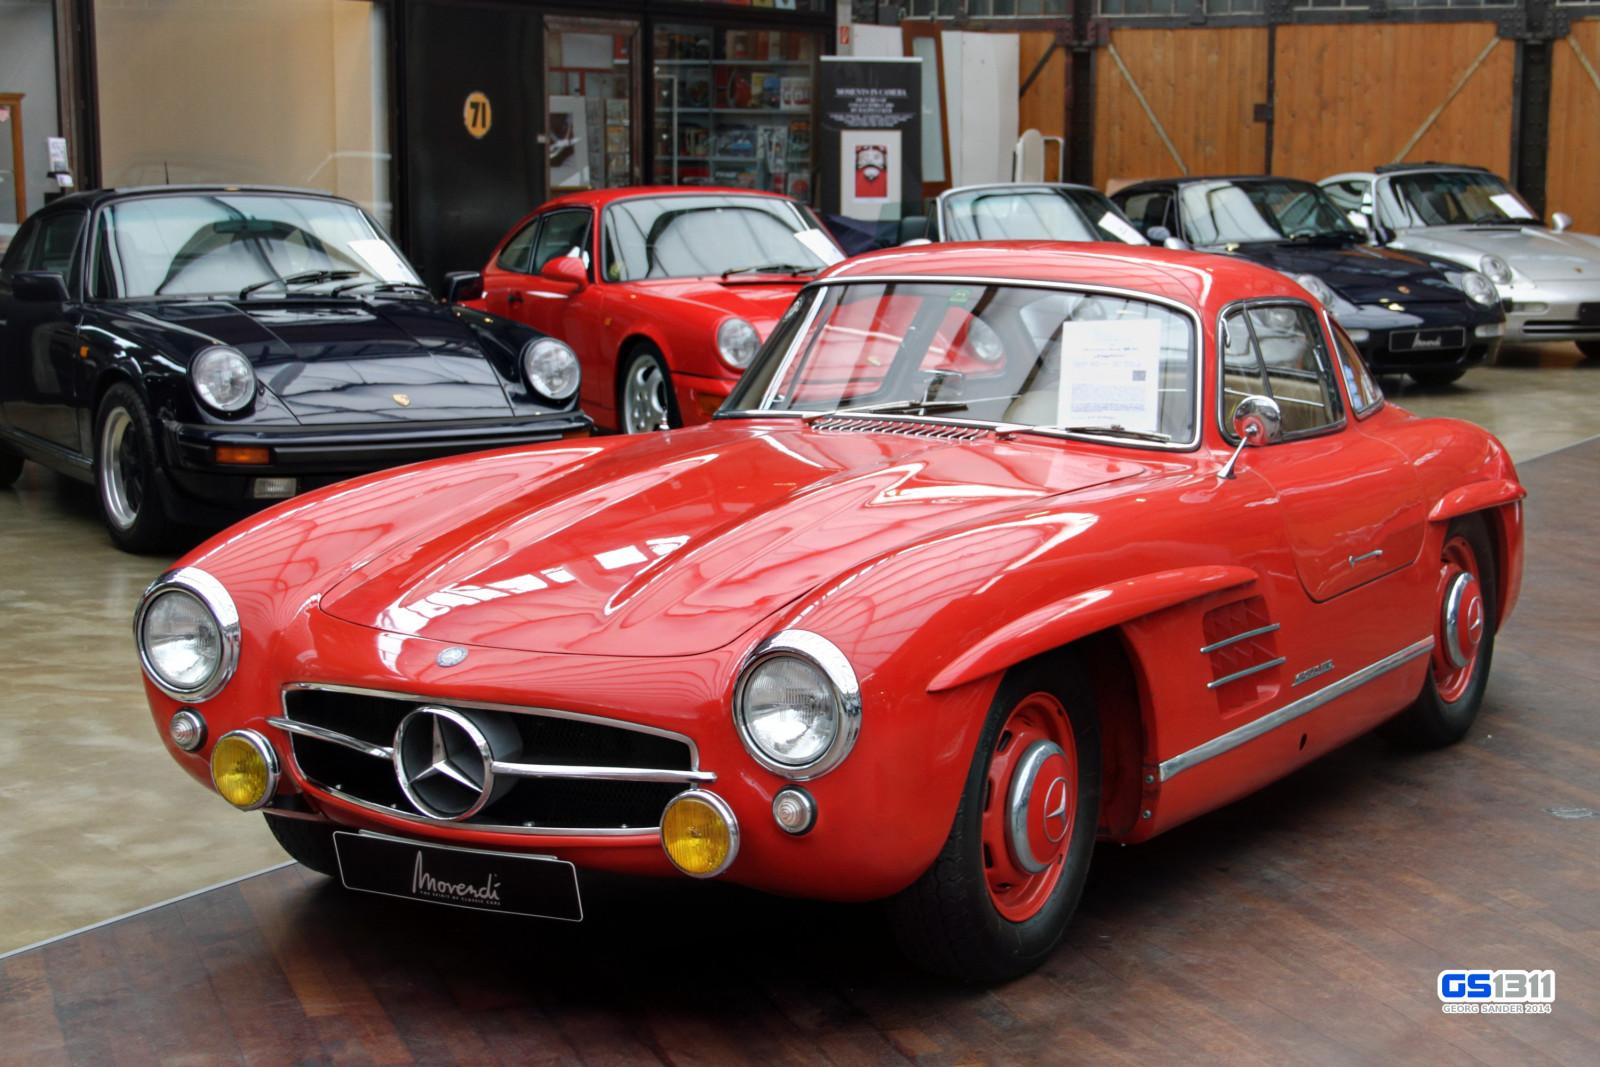 Hintergrundbilder : Alt, Rot, Fahrzeug, Mercedes Benz